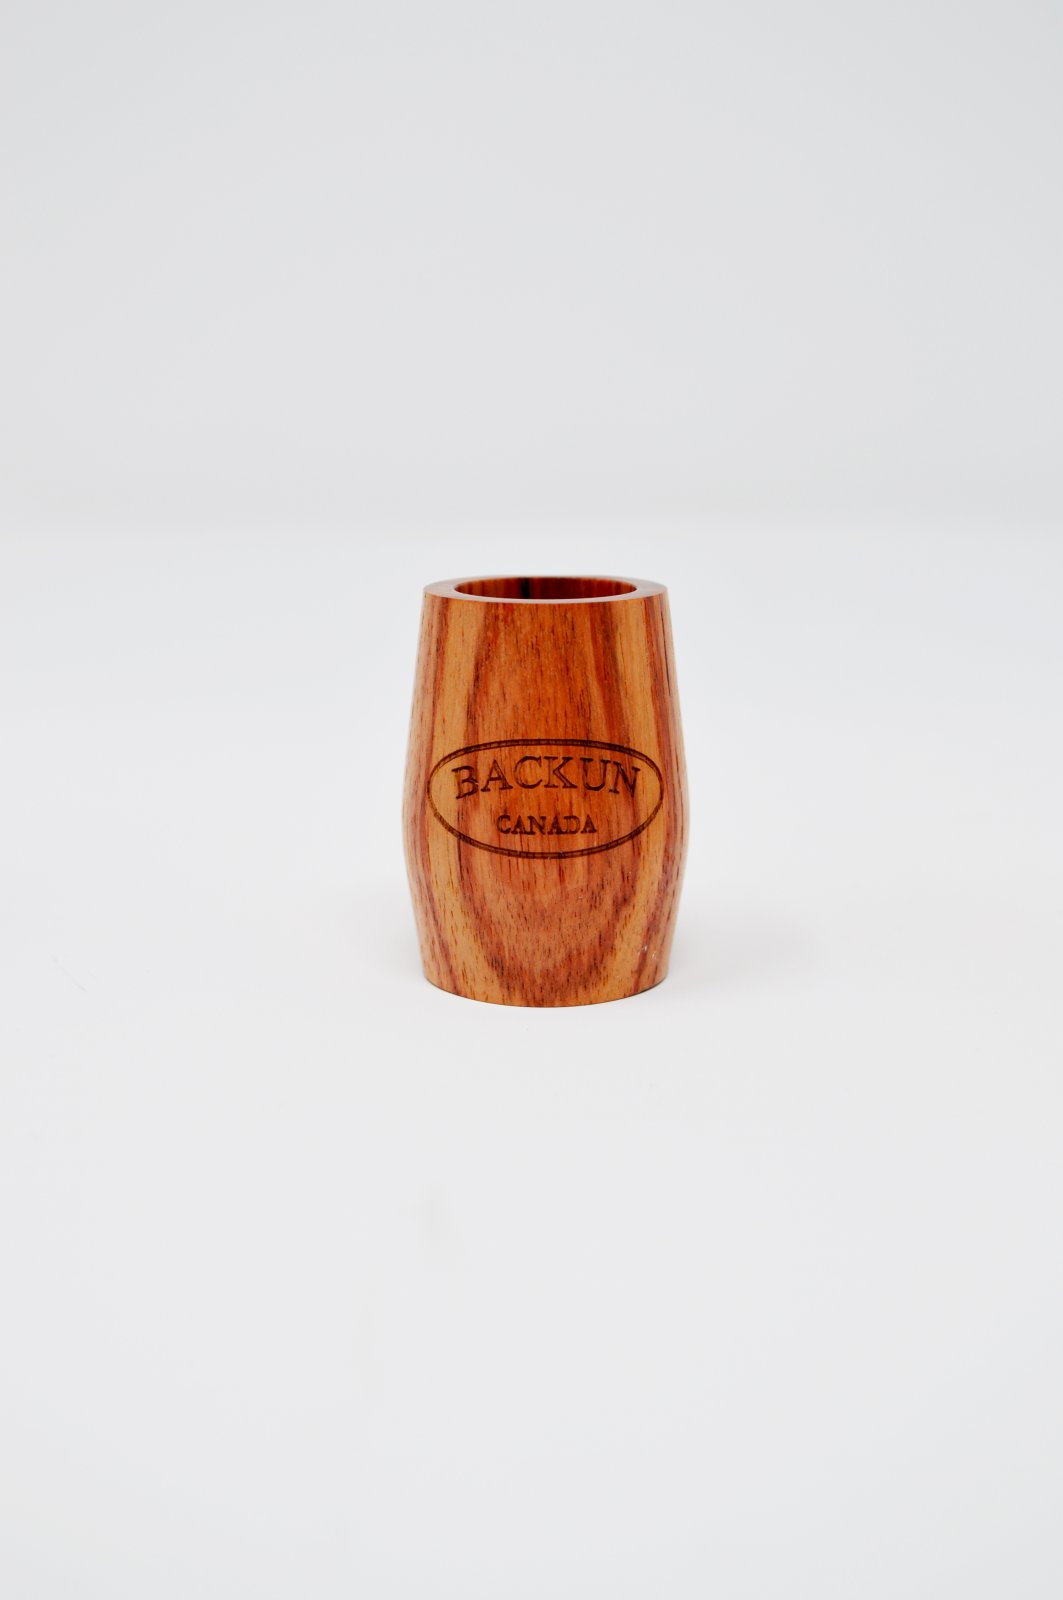 Backun Tulip Wood 43mm Eb Clarinet Barrel